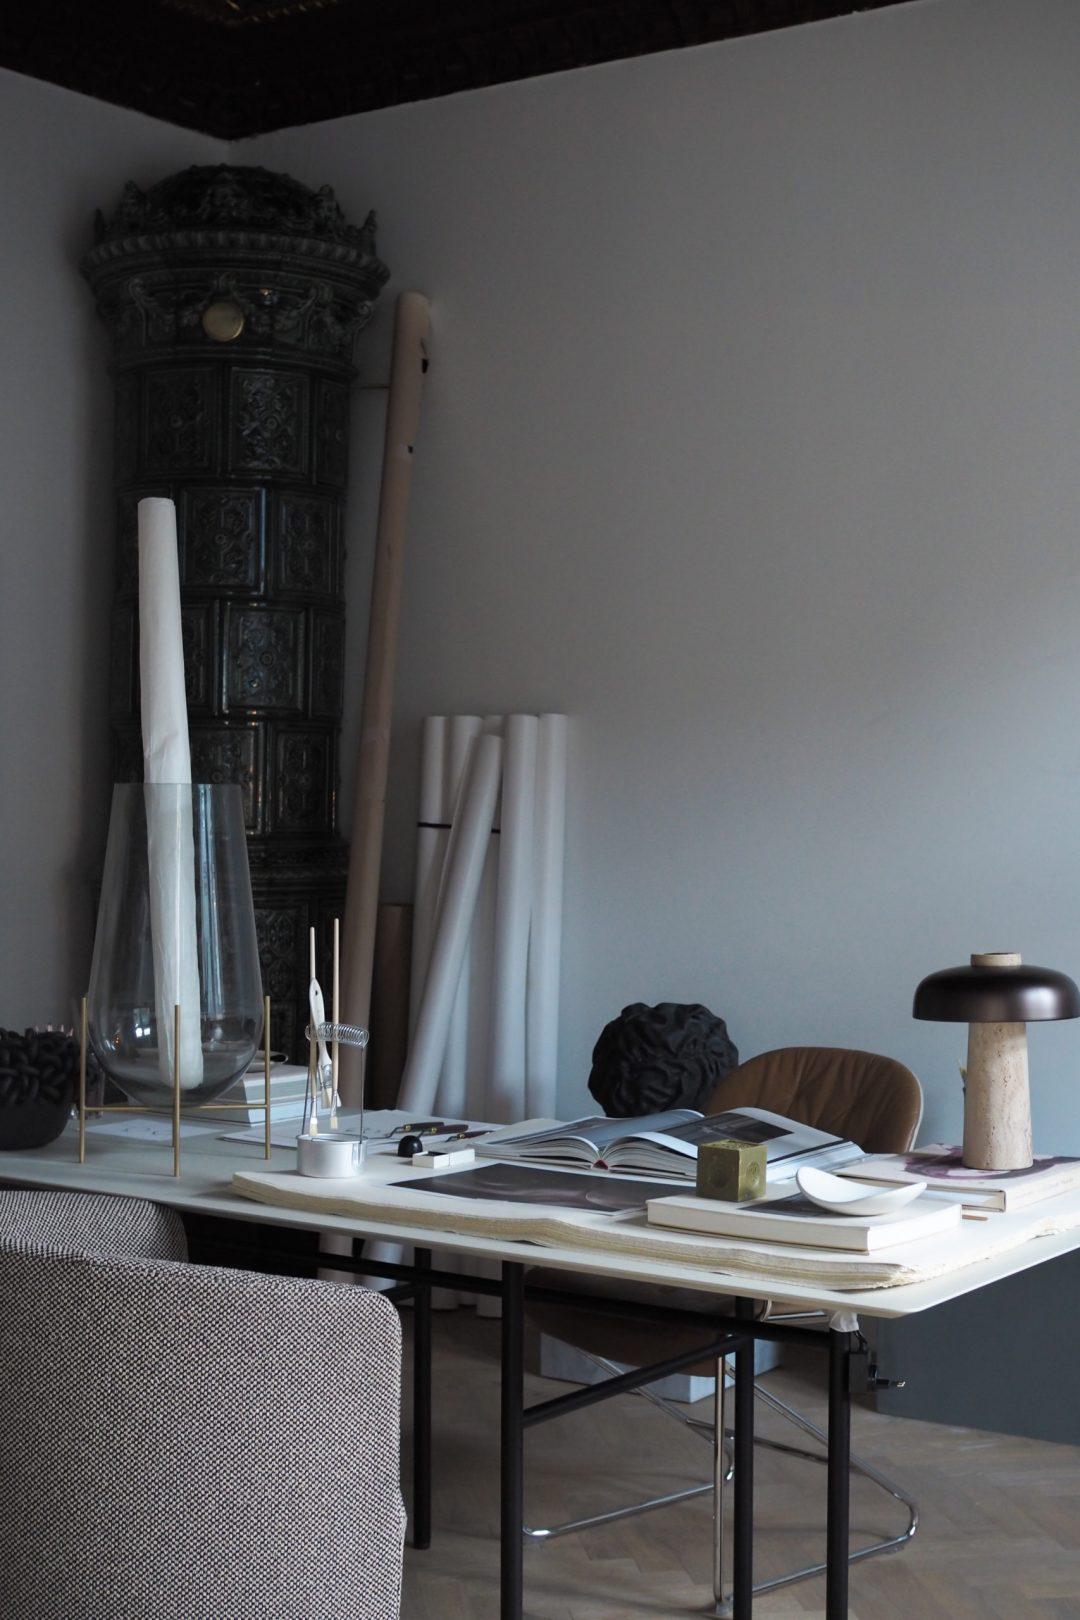 A sculptor's studio in Stockholm